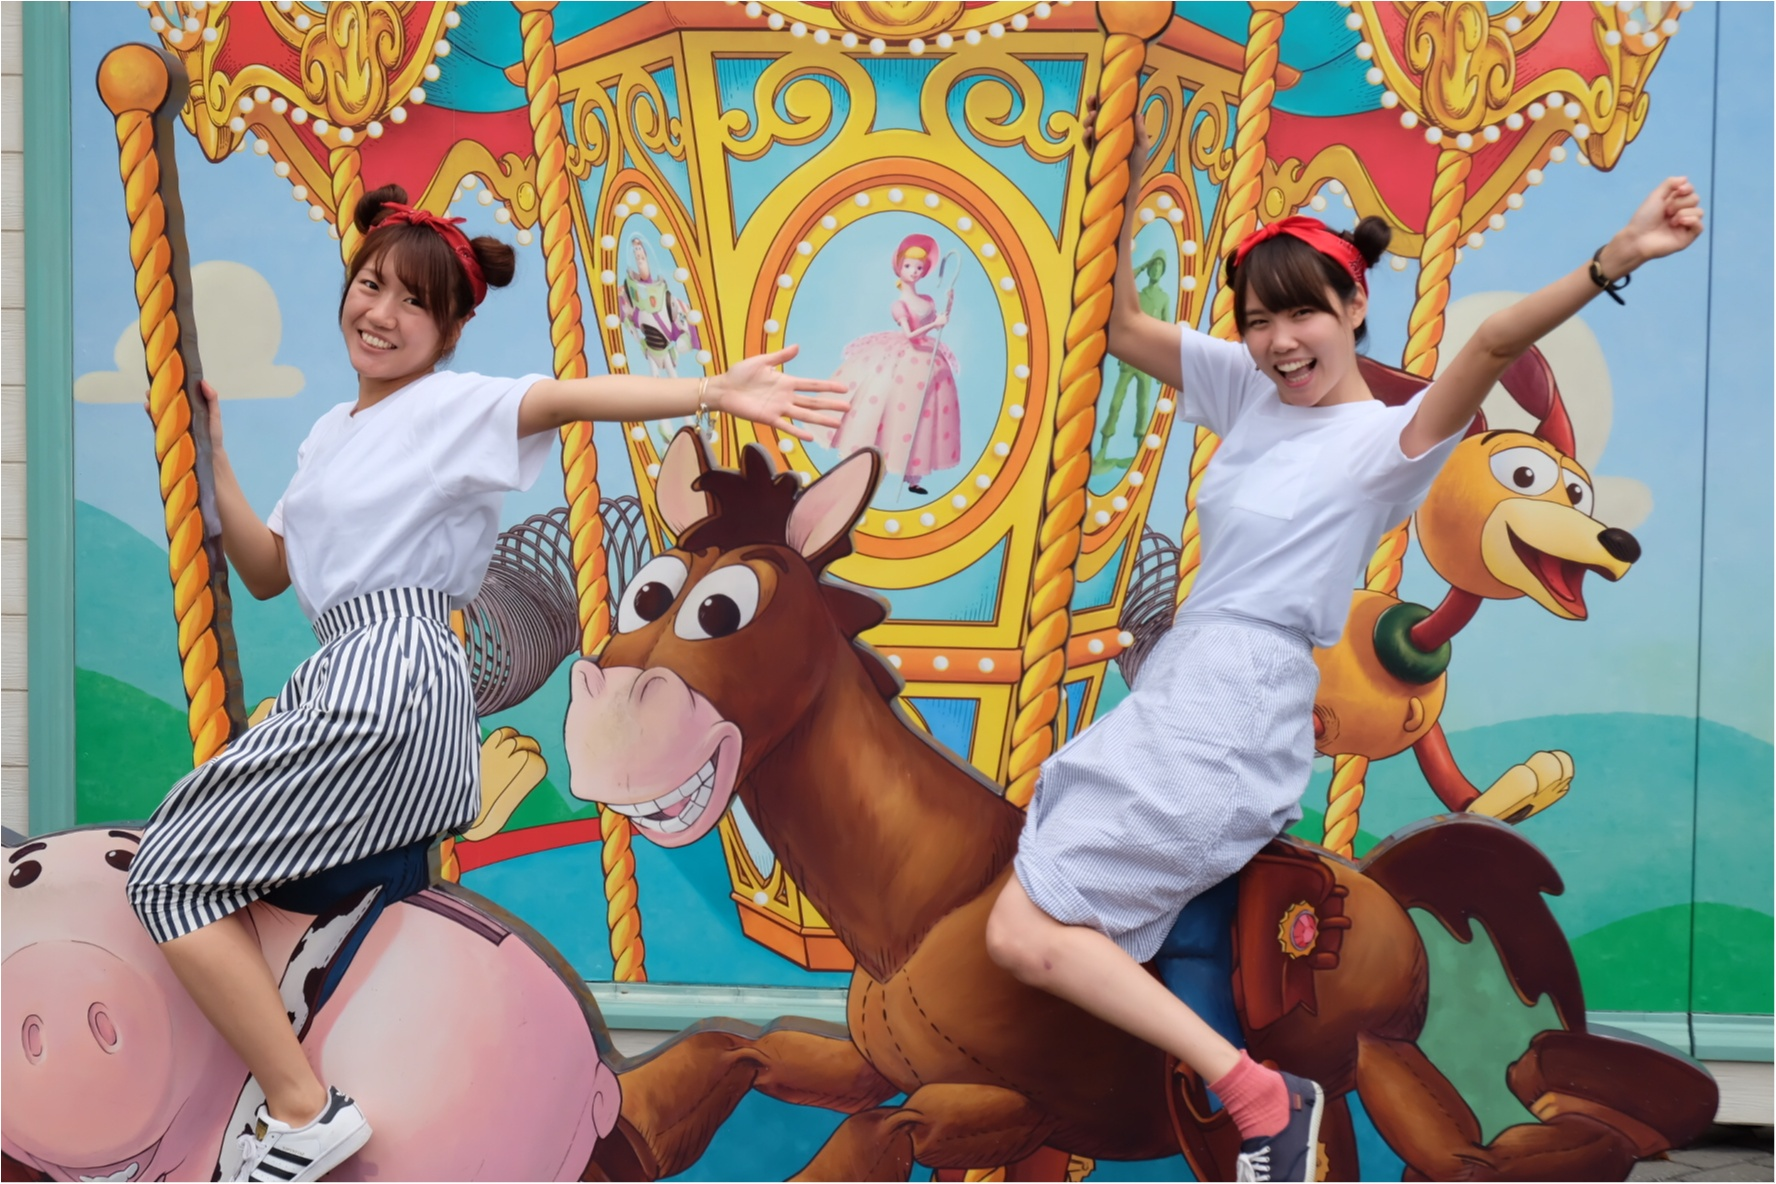 …ஐ TDS 15th anni☆定番から穴場まで撮影スポット10選 ஐ୪¨ଞ_23